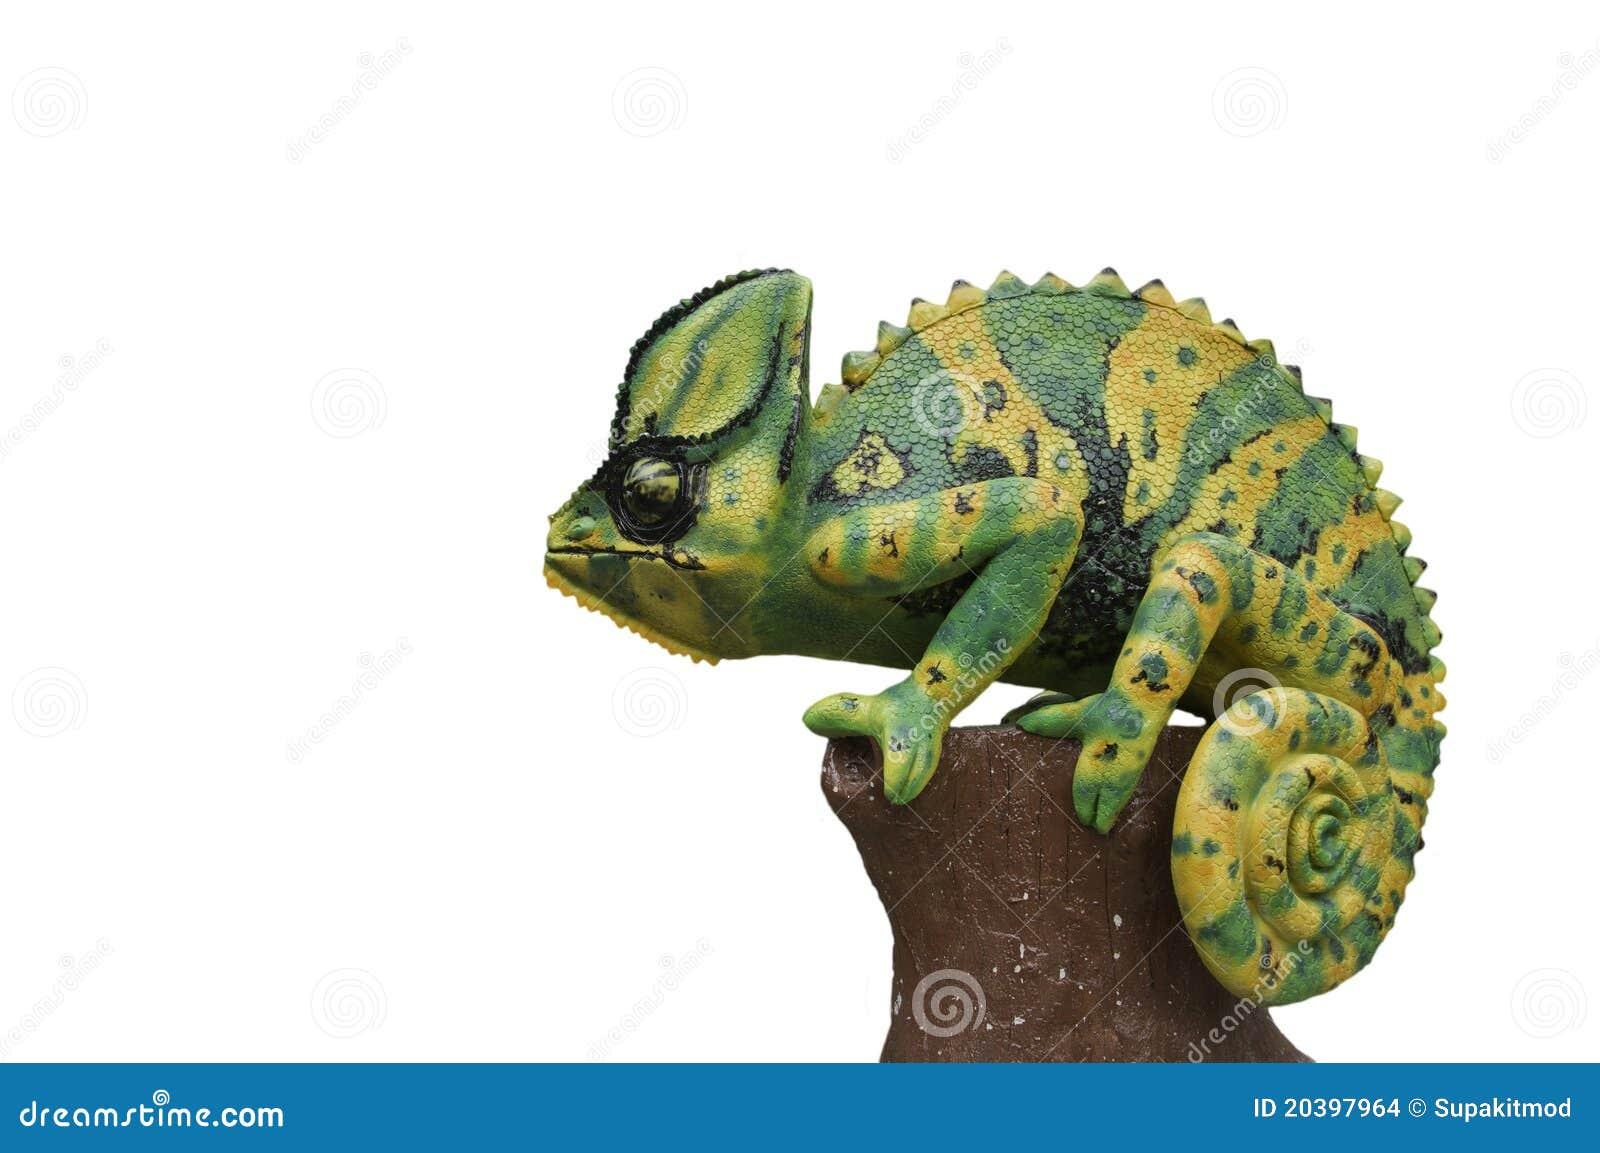 Statue de caméléons